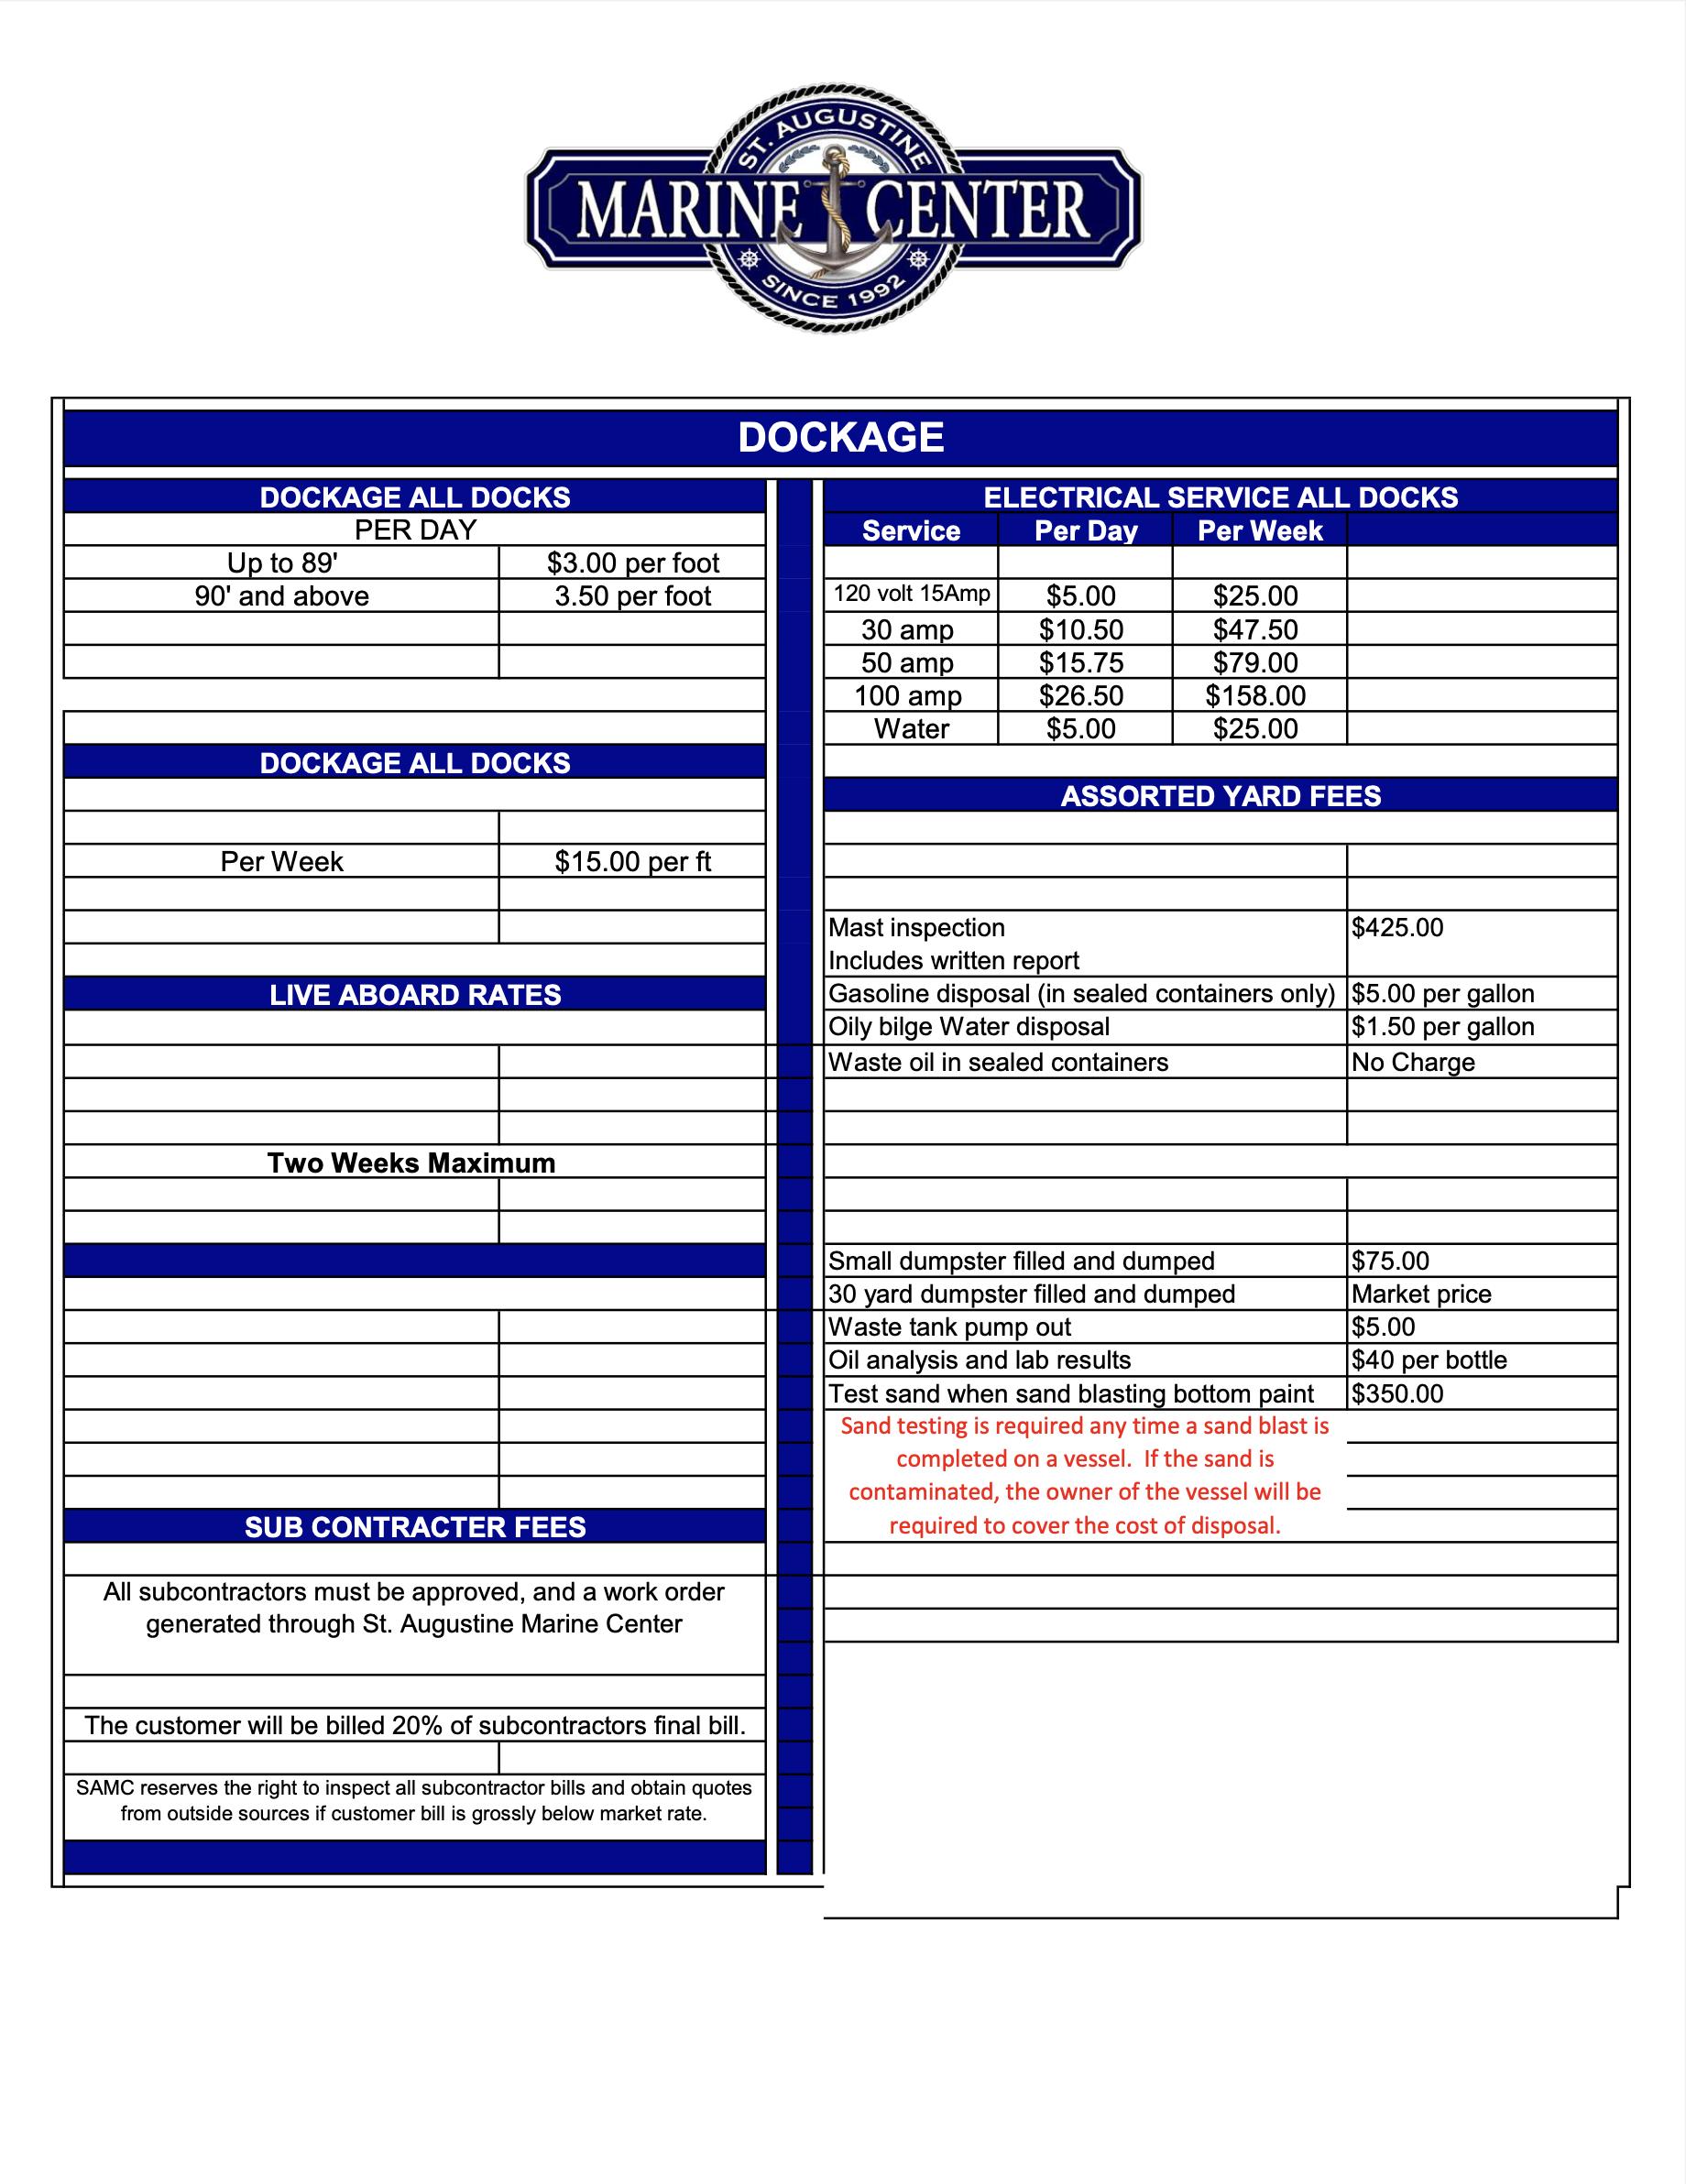 St Augustine Marine Center Rates 10-21 p2